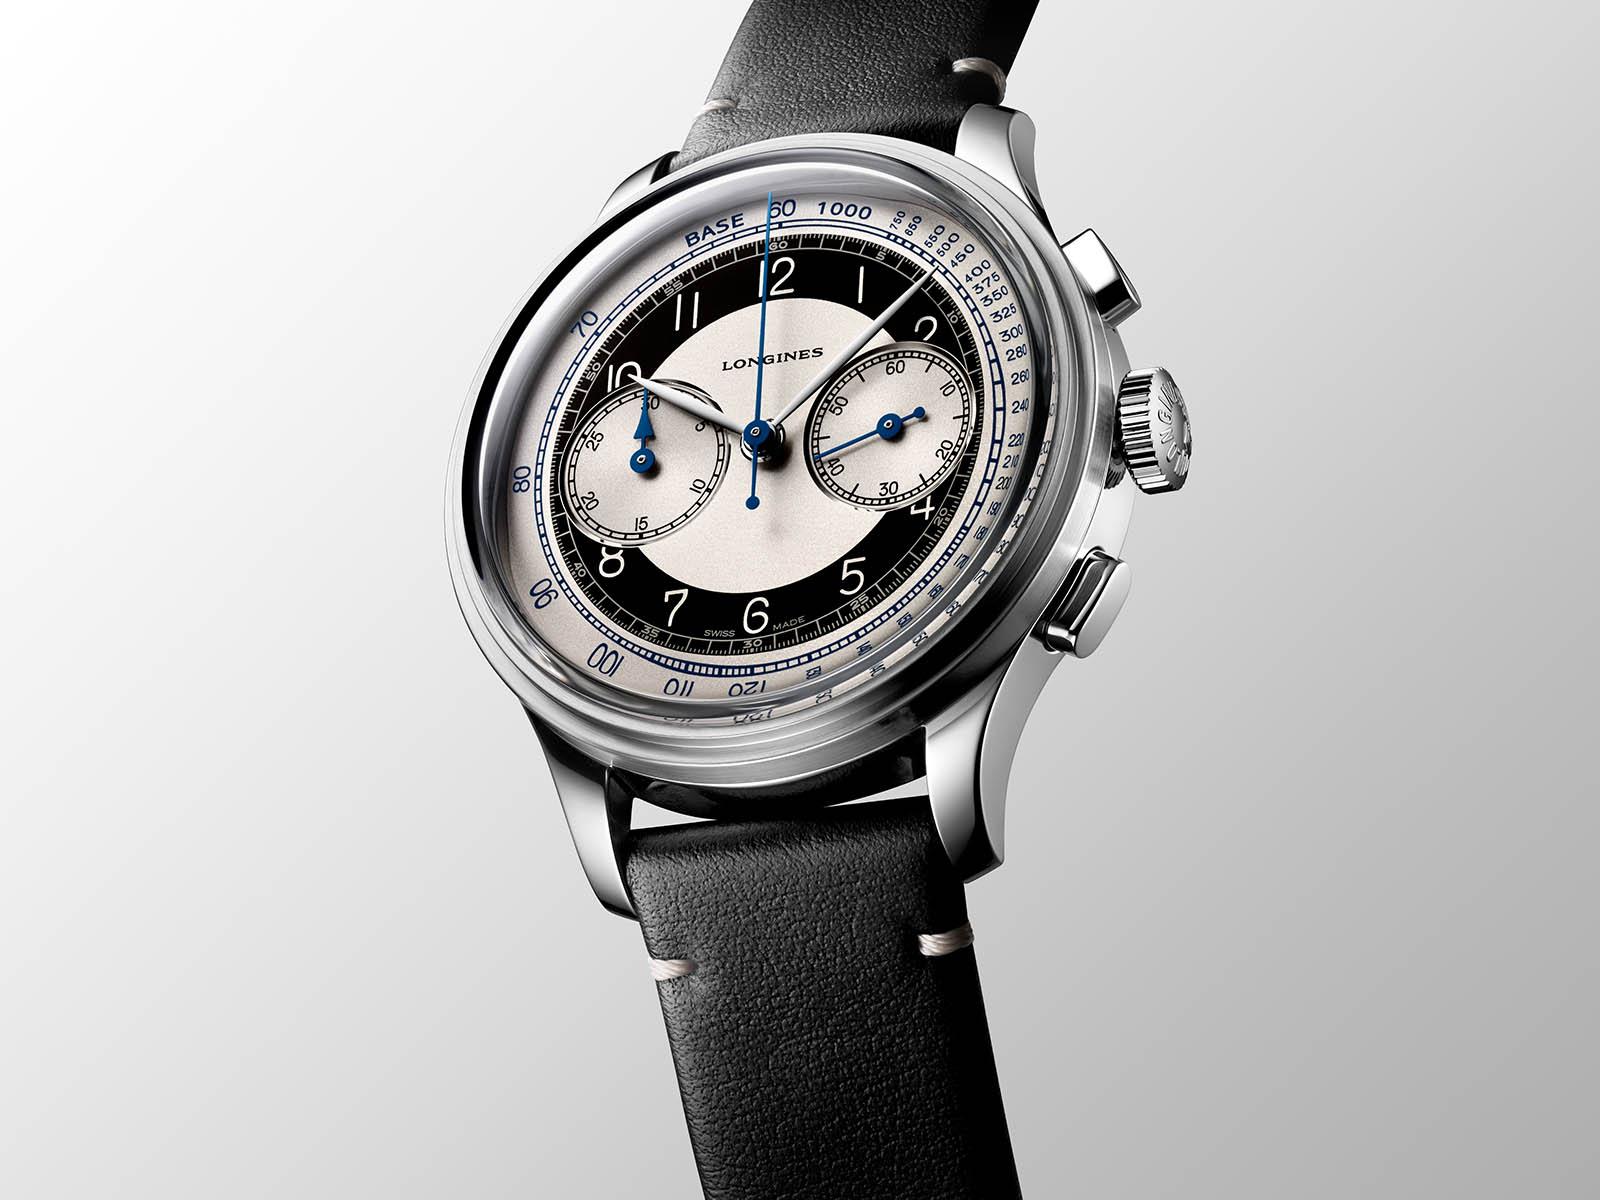 l2-830-4-93-0-longines-heritage-classic-chronograph-3.jpg